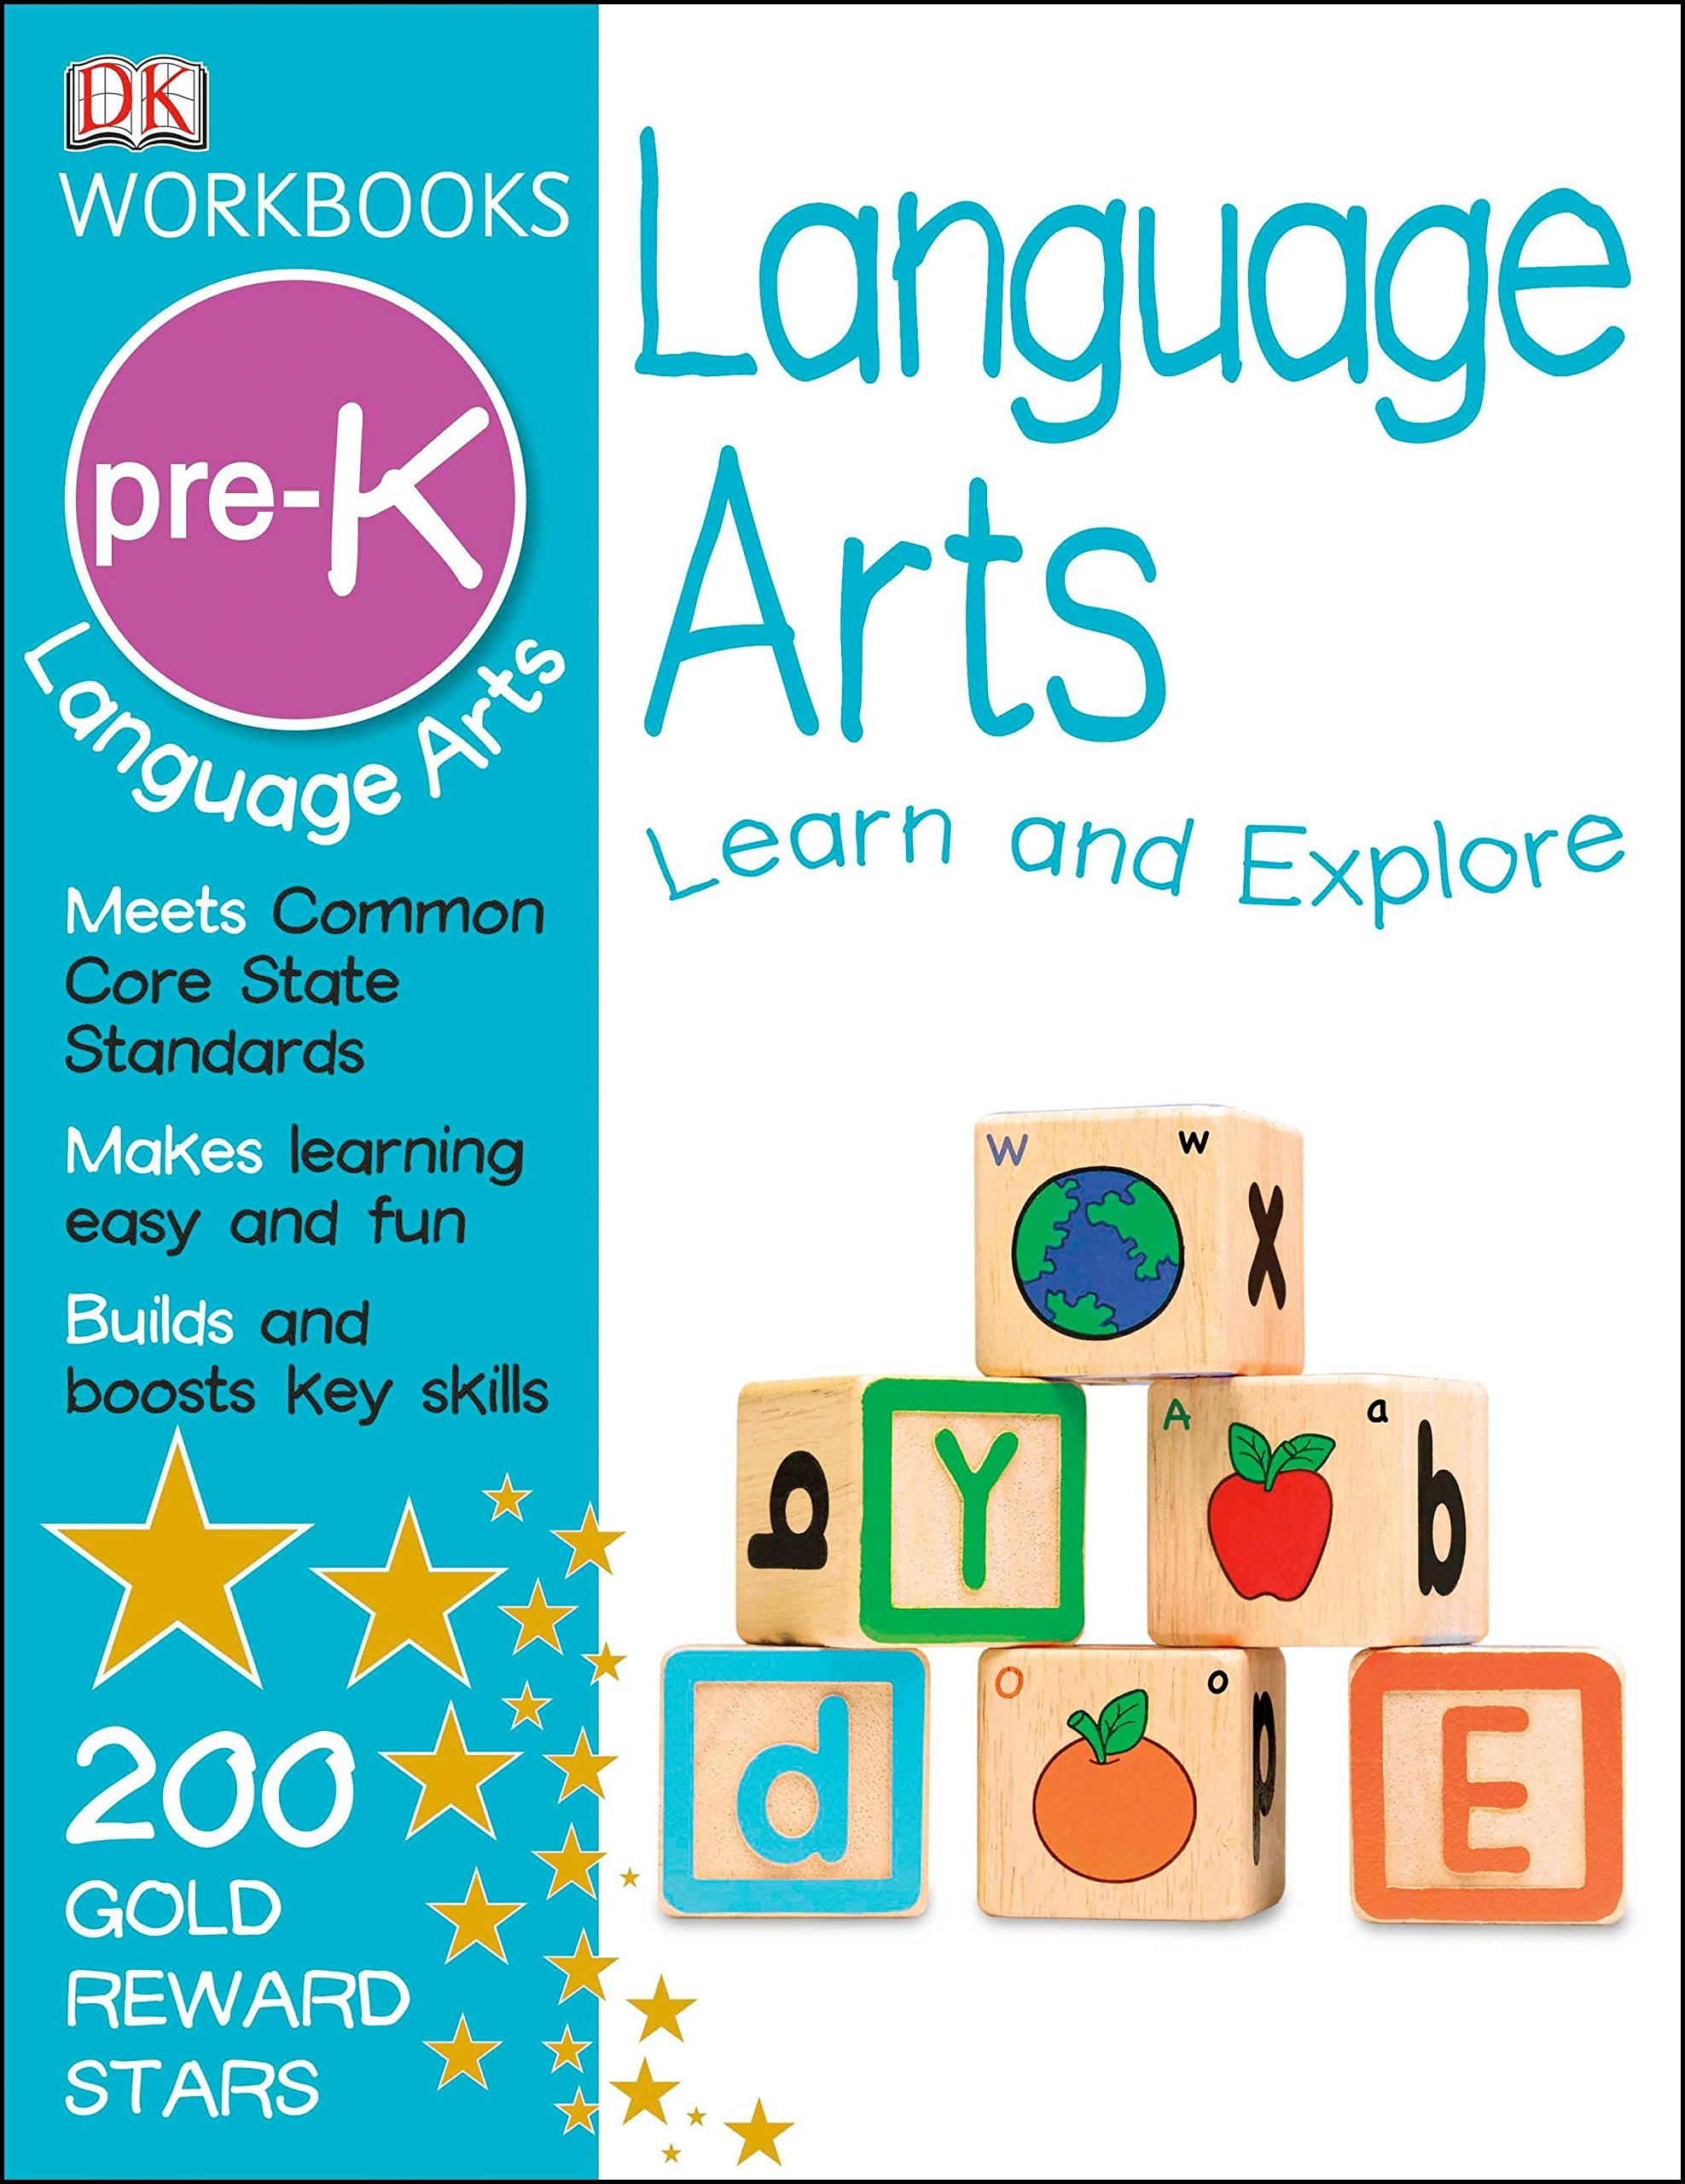 DK Workbooks: Language Arts, Pre-K: DK: 9781465417367: Amazon.com: Books